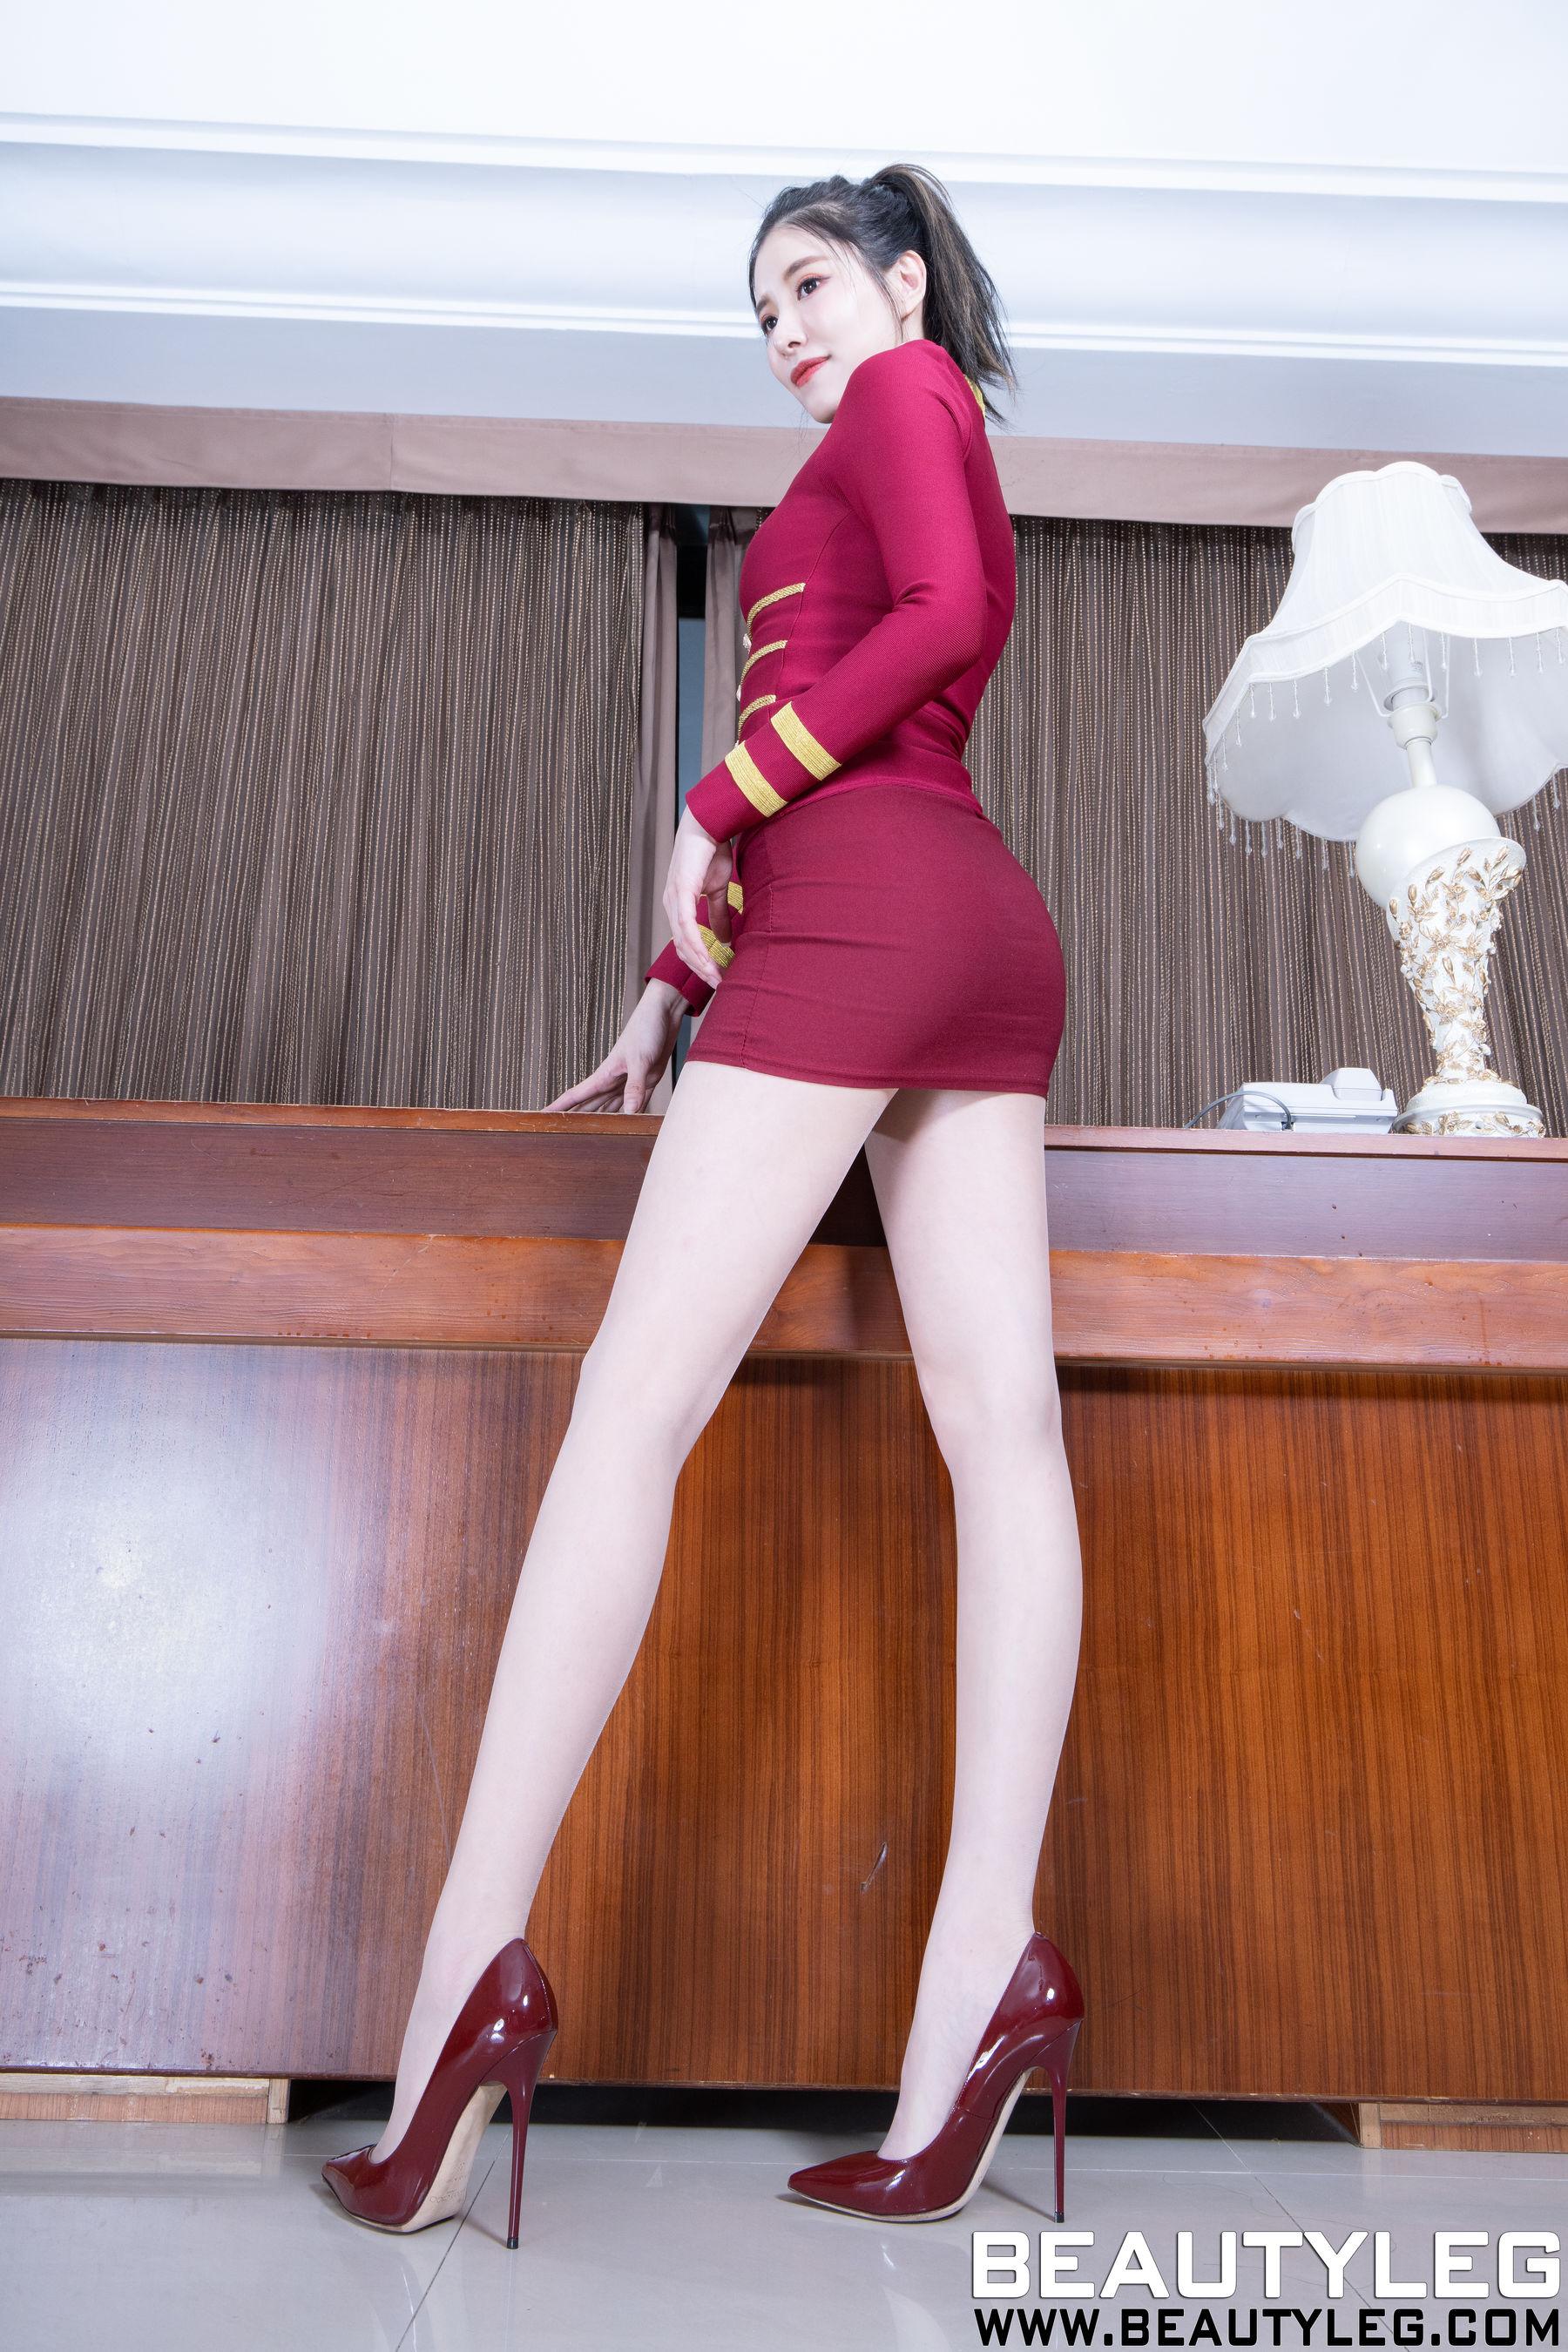 VOL.1604 [Beautyleg]制服:陈玉雪(腿模Abby)超高清个人性感漂亮大图(46P)